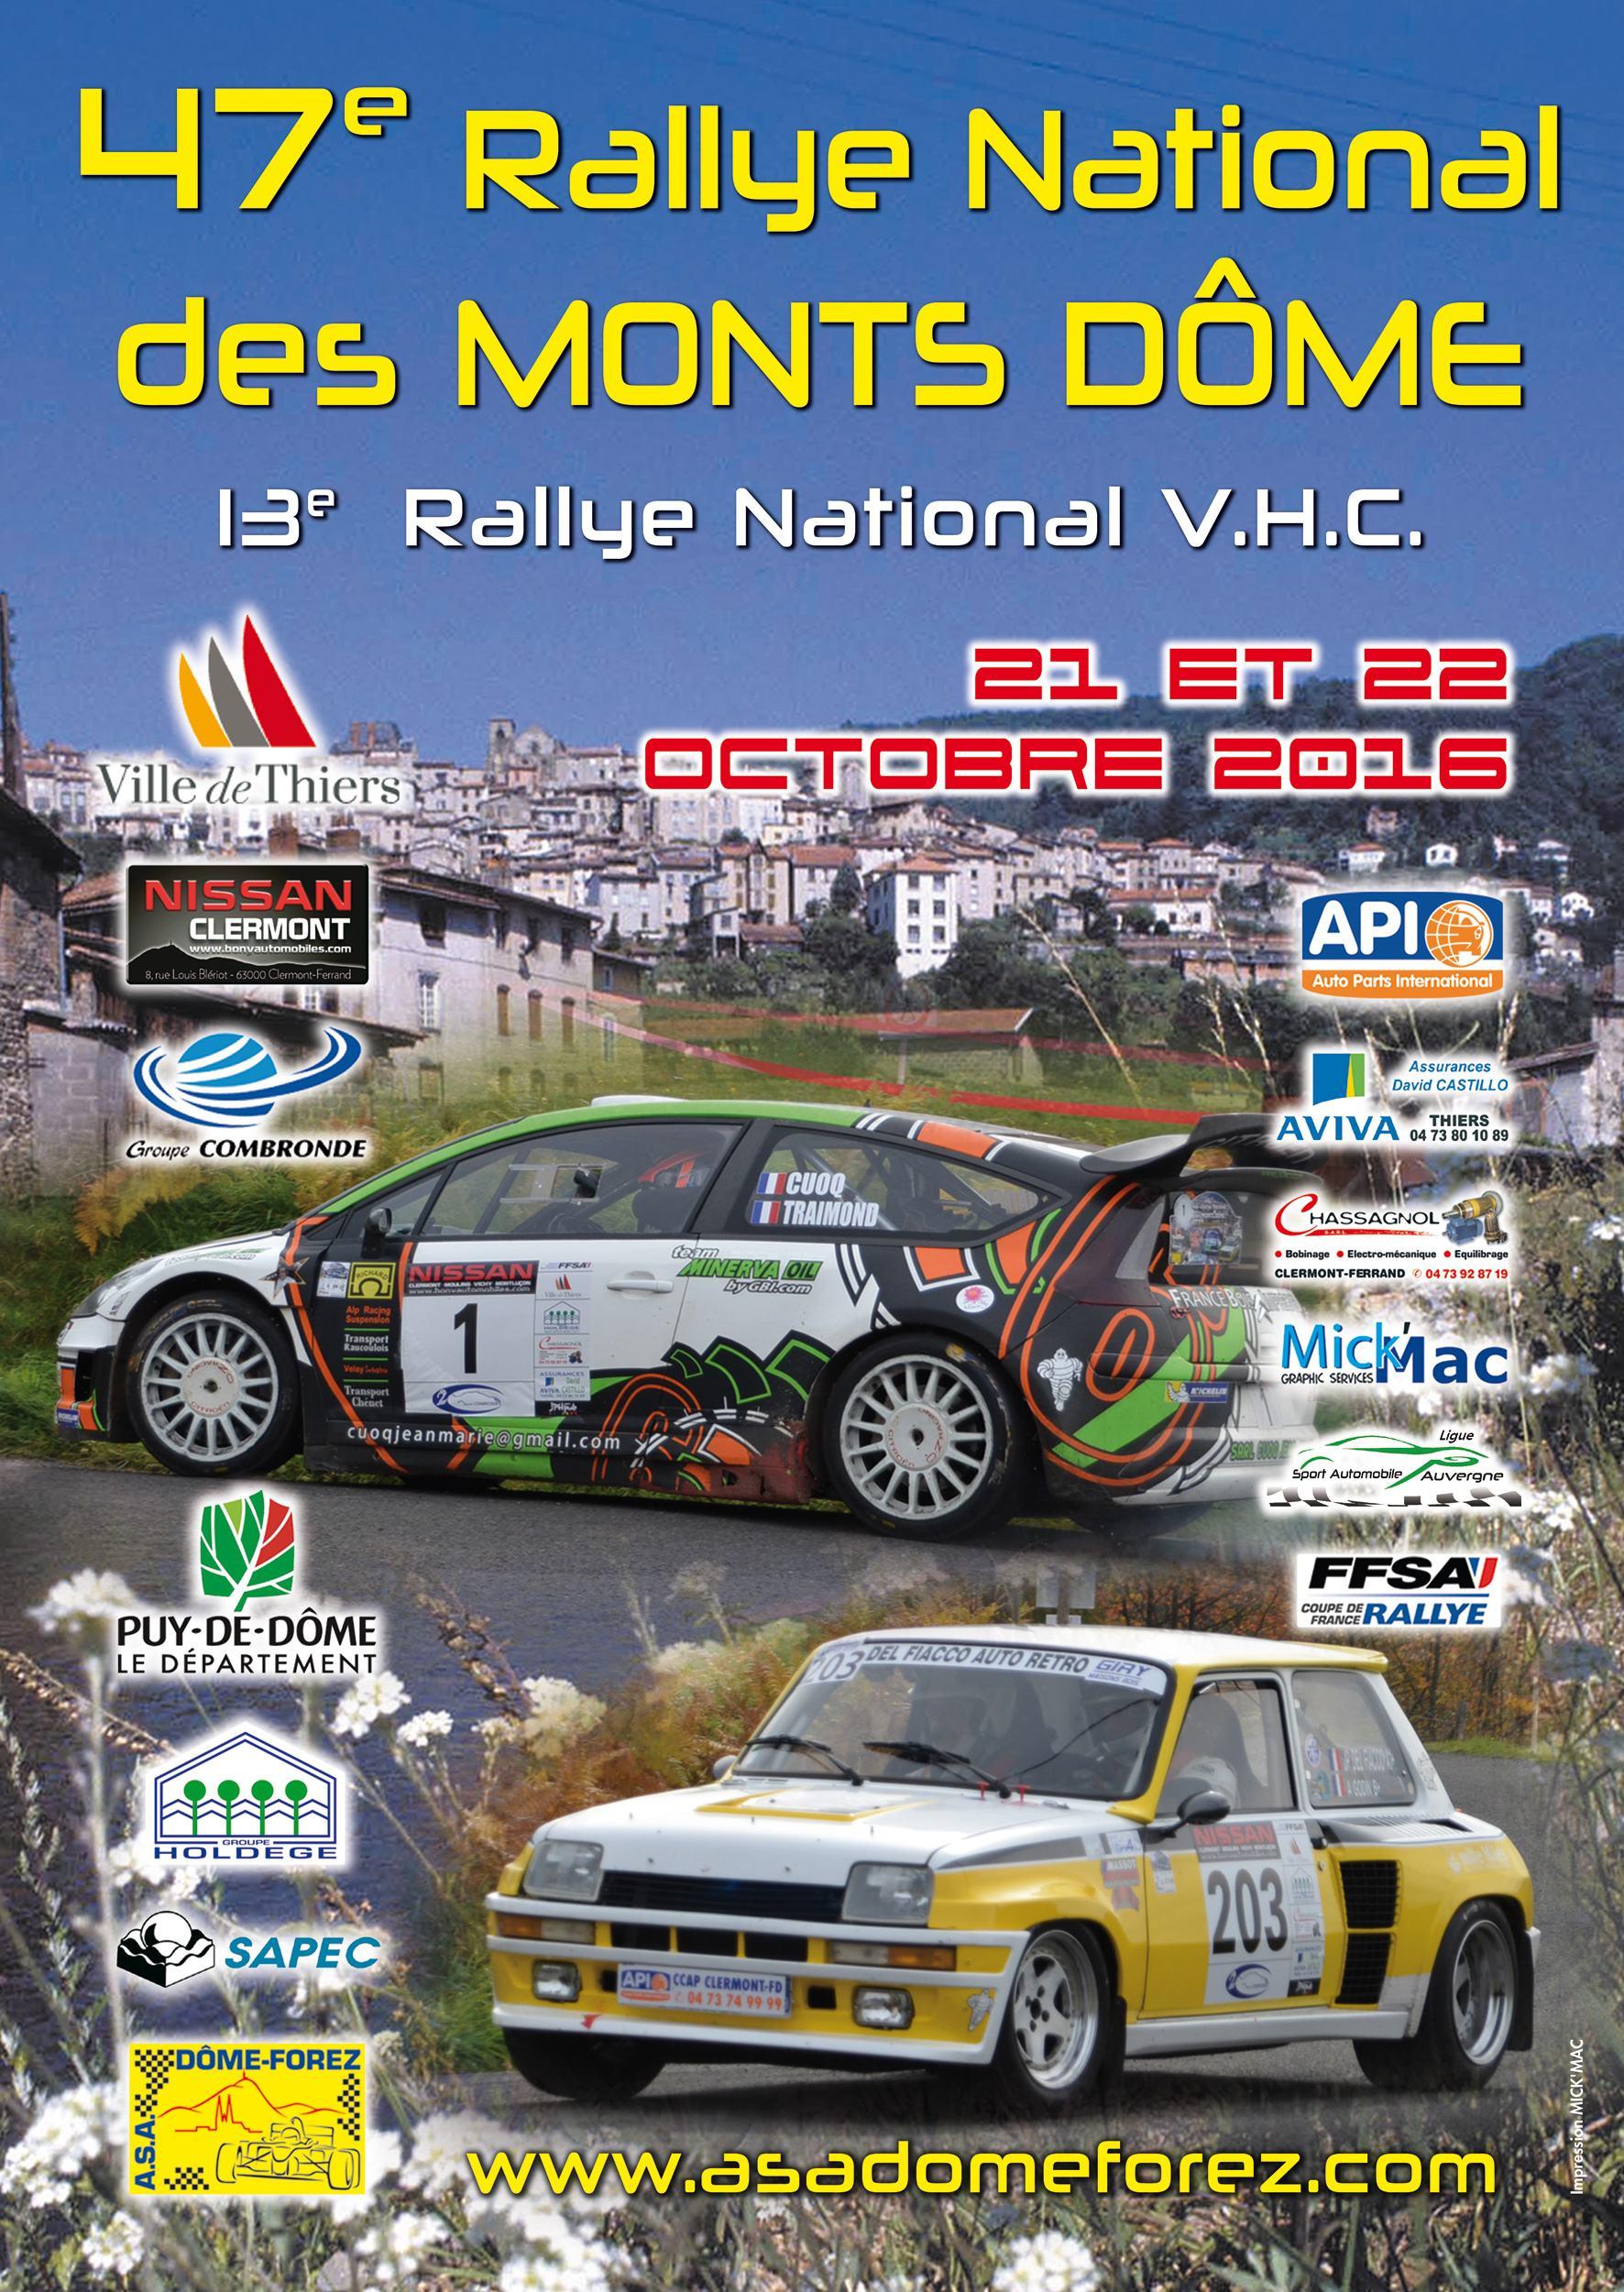 Classement-Direct-Monts-Dome-2016